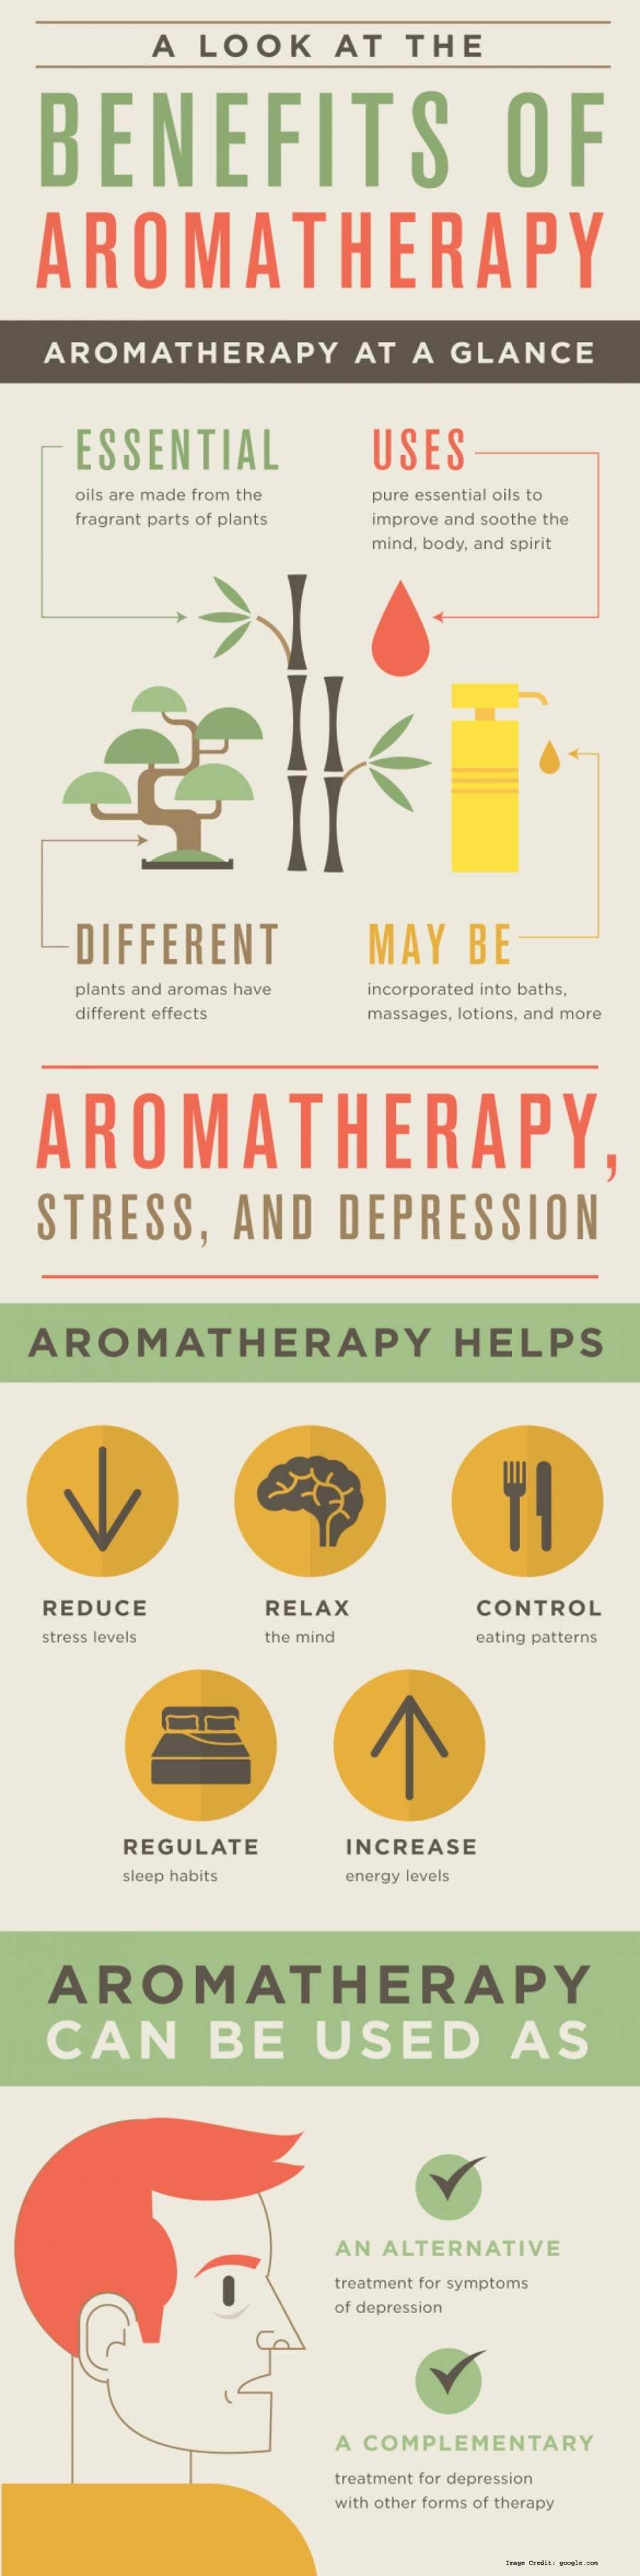 Aromatherapy Info